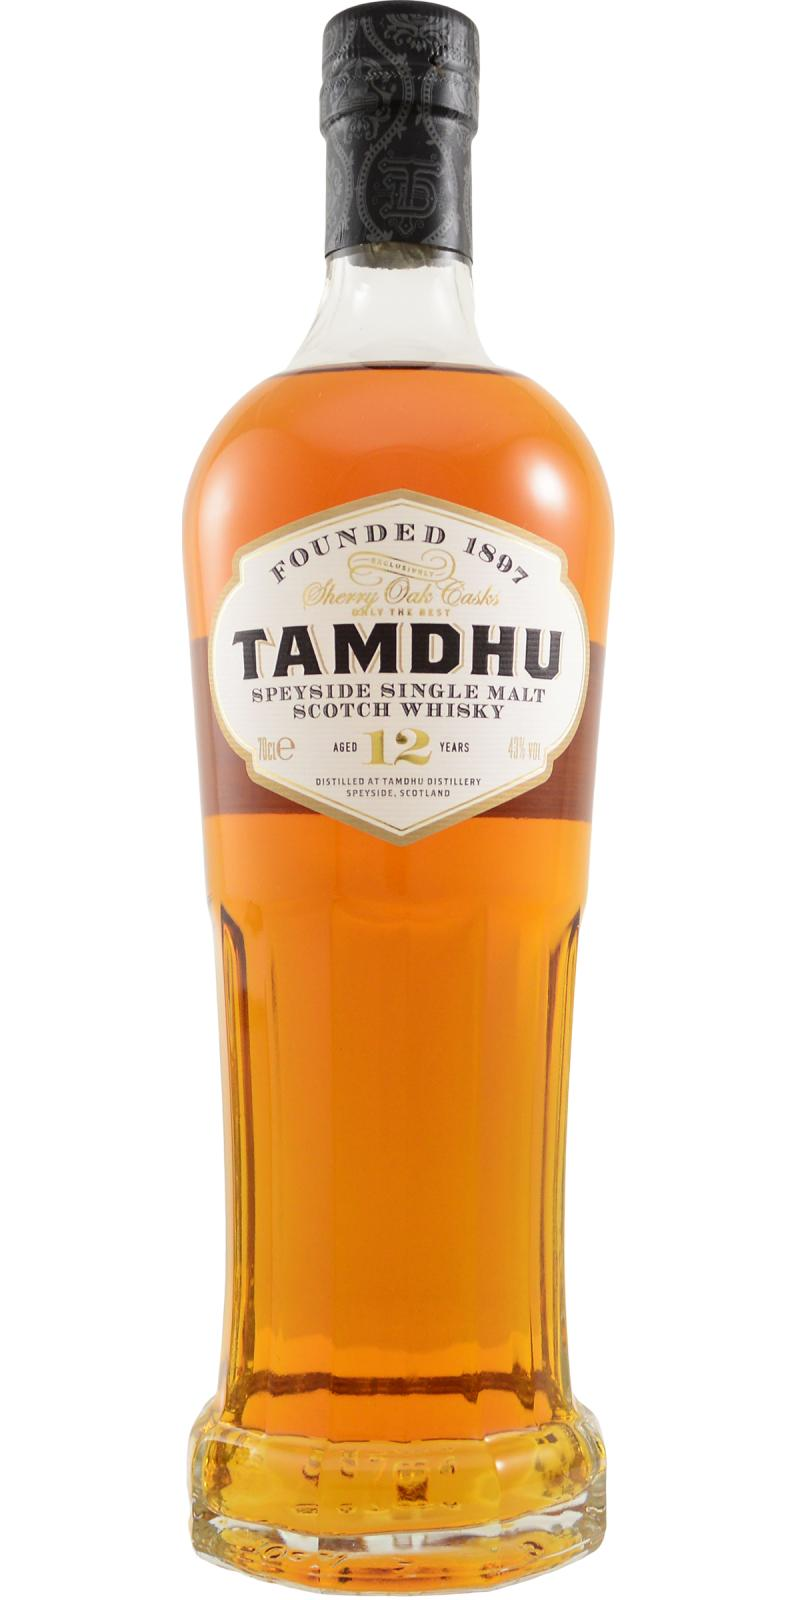 Tamdhu 12-year-old